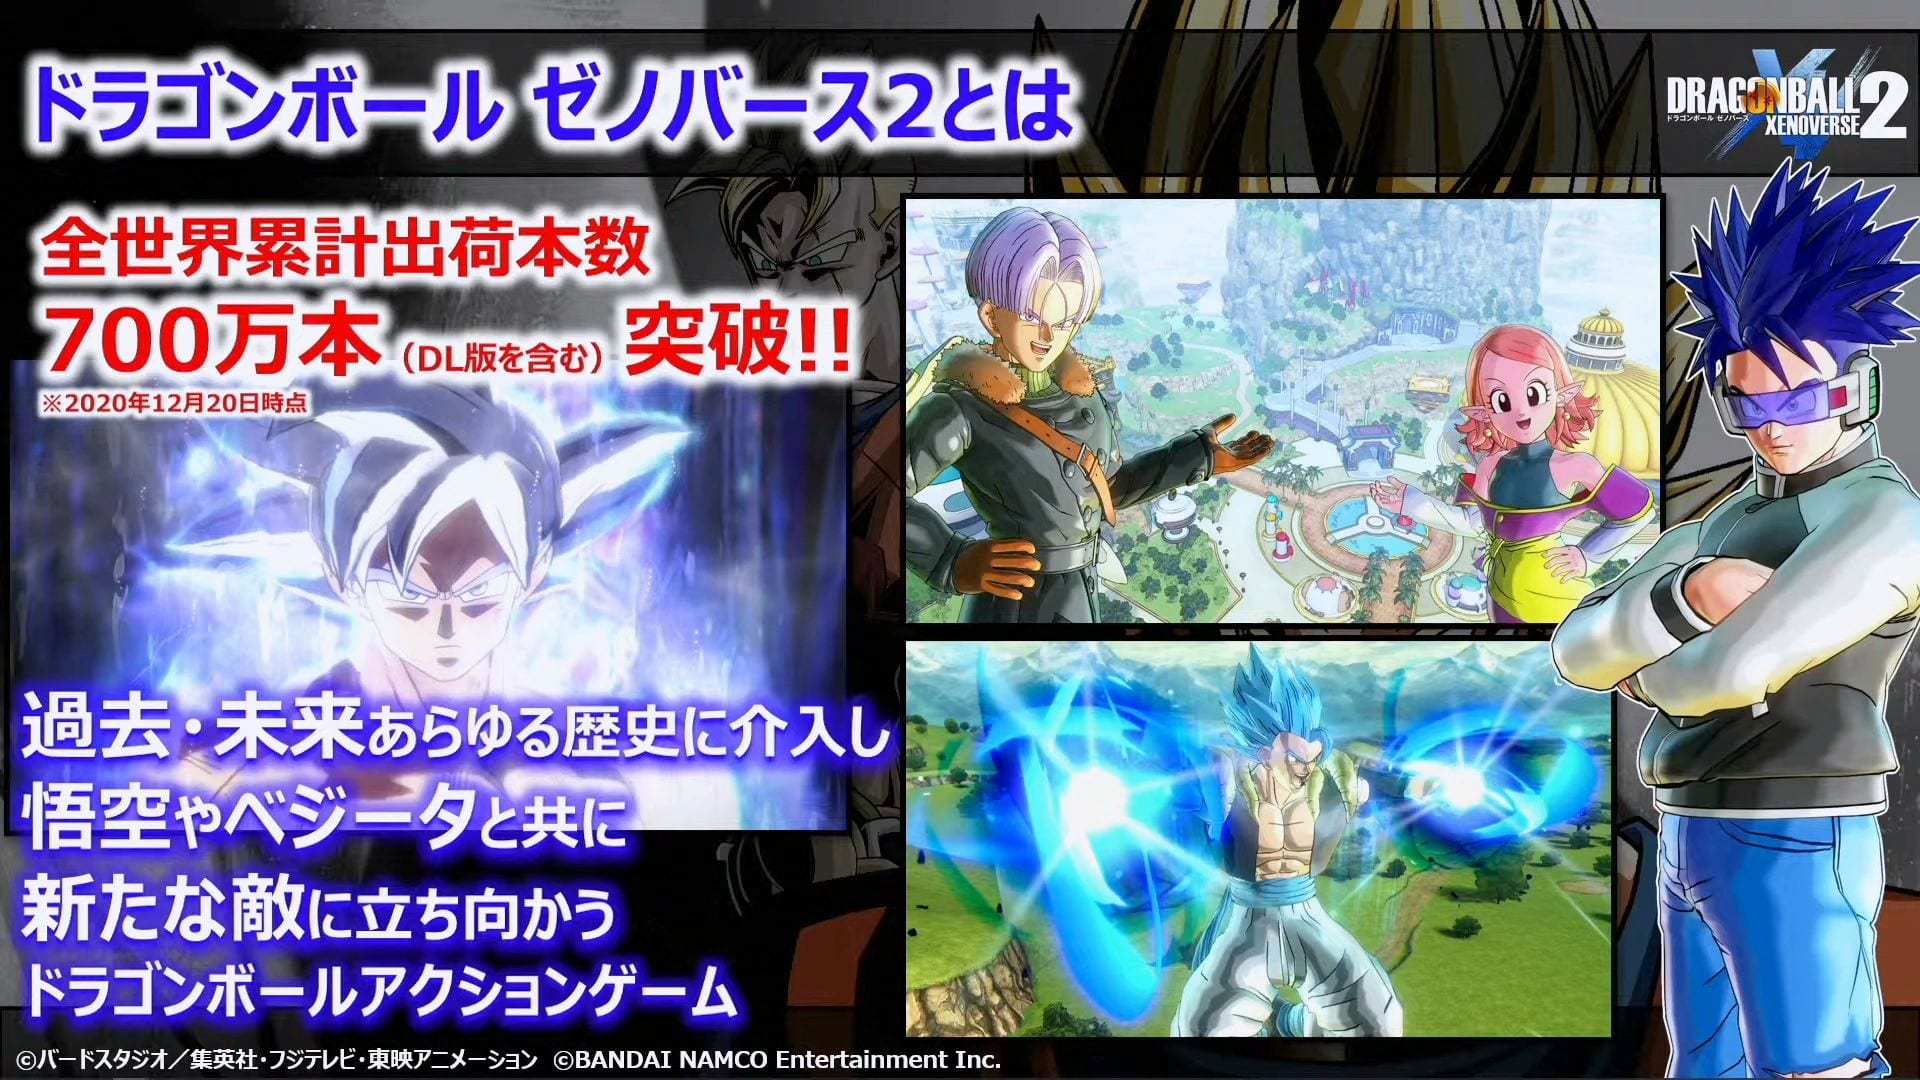 Dragon Ball Xenoverse 2 Reveals Paikuhan DLC & Free Replace; Has Shipped 7 Million Items 2